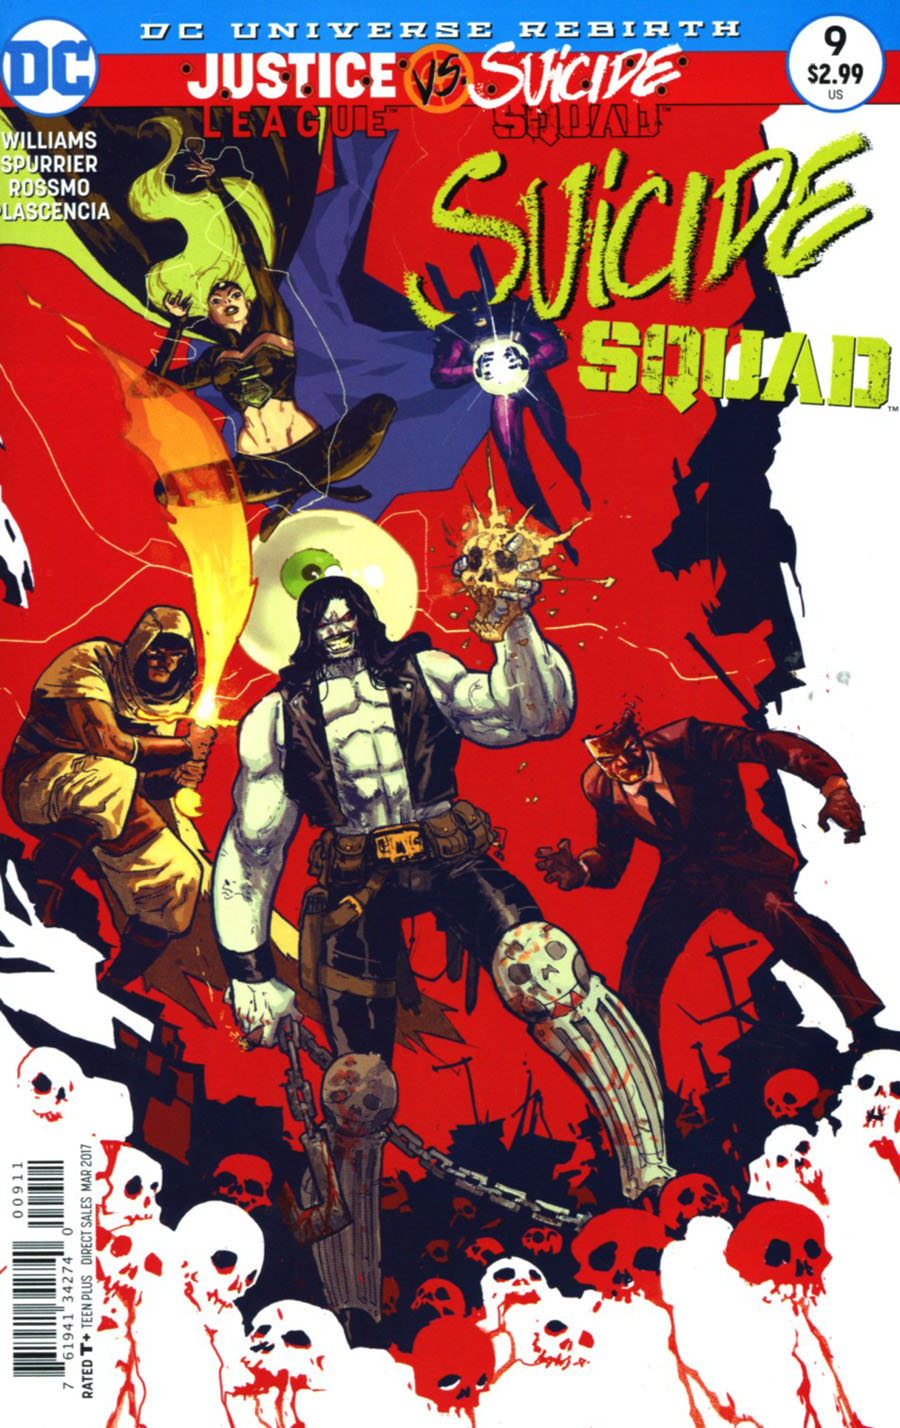 Suicide Squad Vol 4 #9 Cover A Regular Riley Rossmo Cover (Justice League vs Suicide Squad Tie-In)